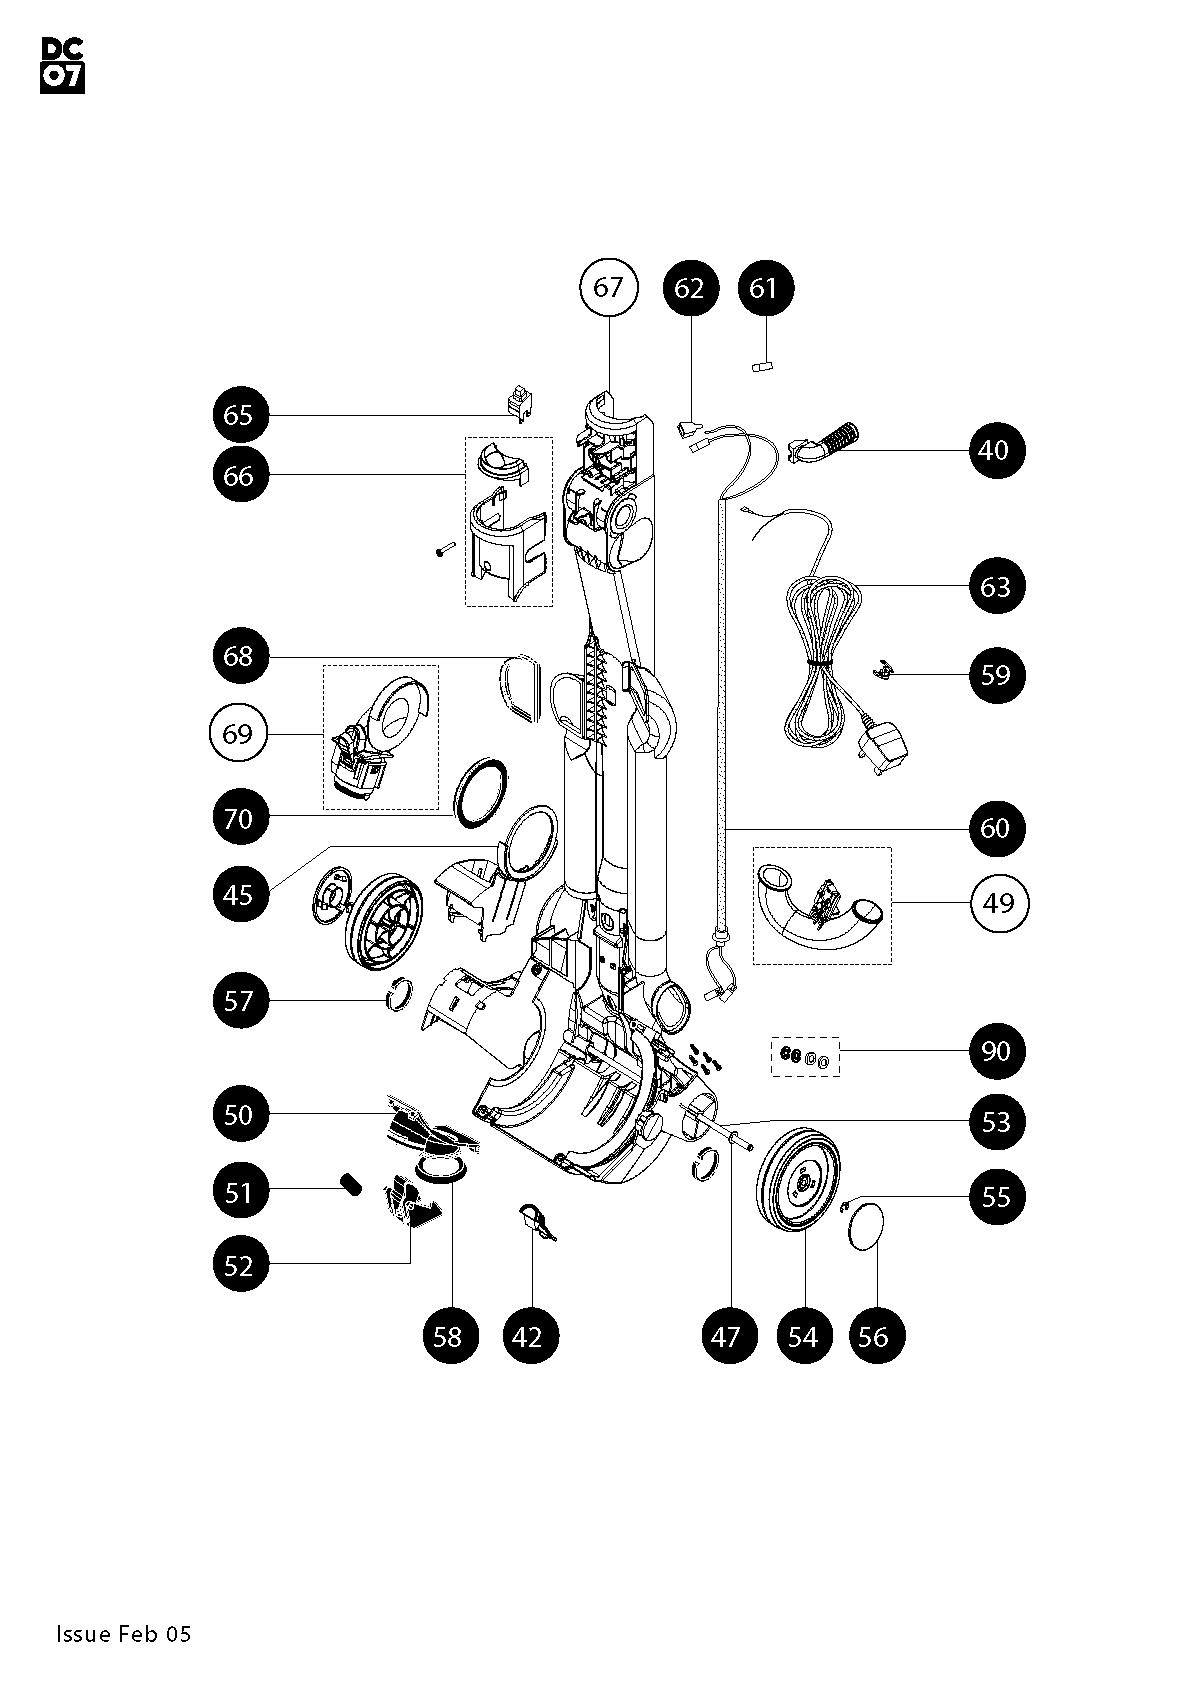 Dyson DC07 Animal (Steel/Lavender) Vacuum Cleaner (Floorcare) Parts |  Partmaster